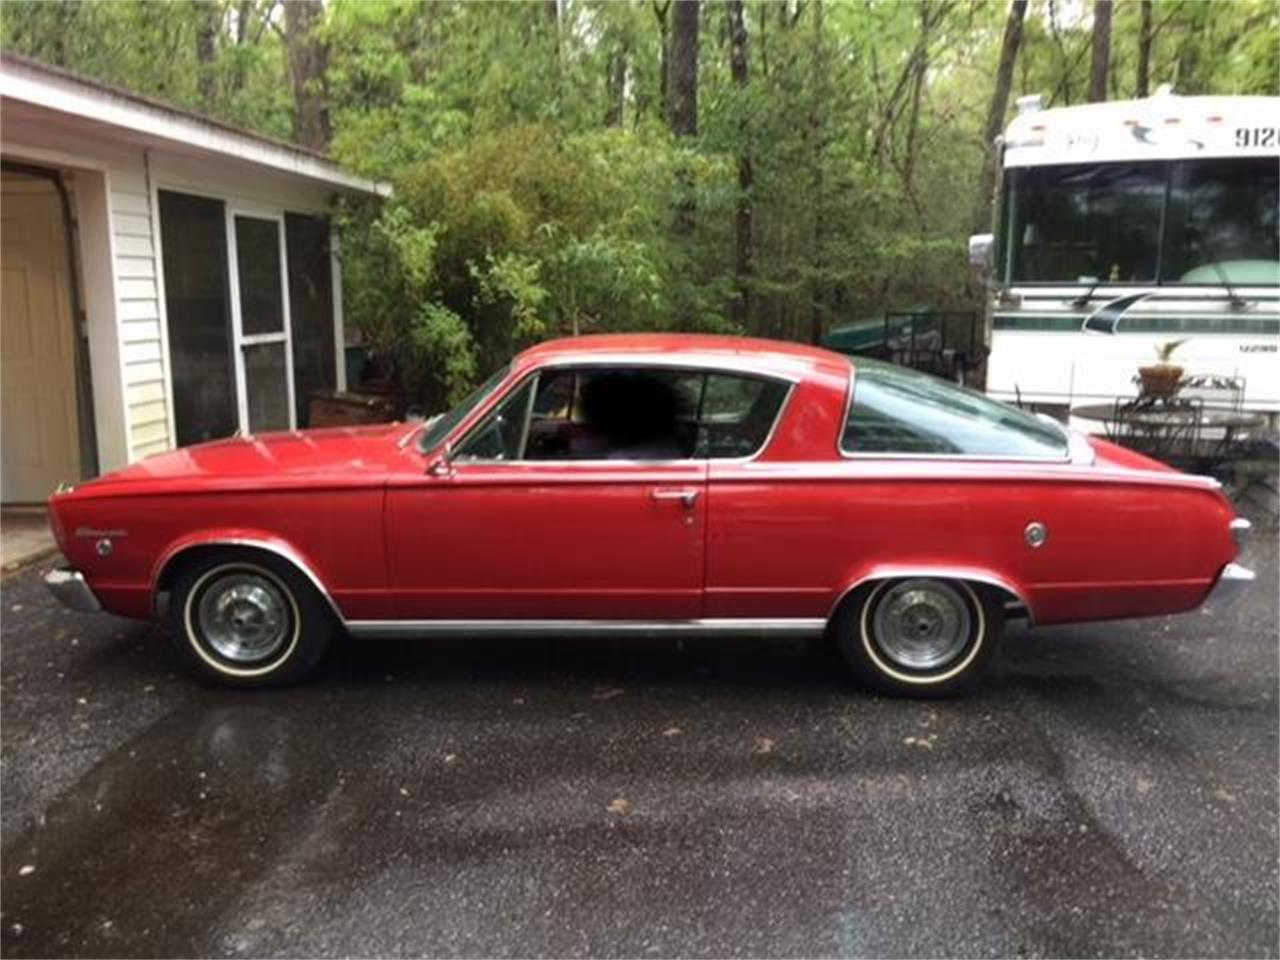 For Sale: 1966 Plymouth Barracuda in orange, California